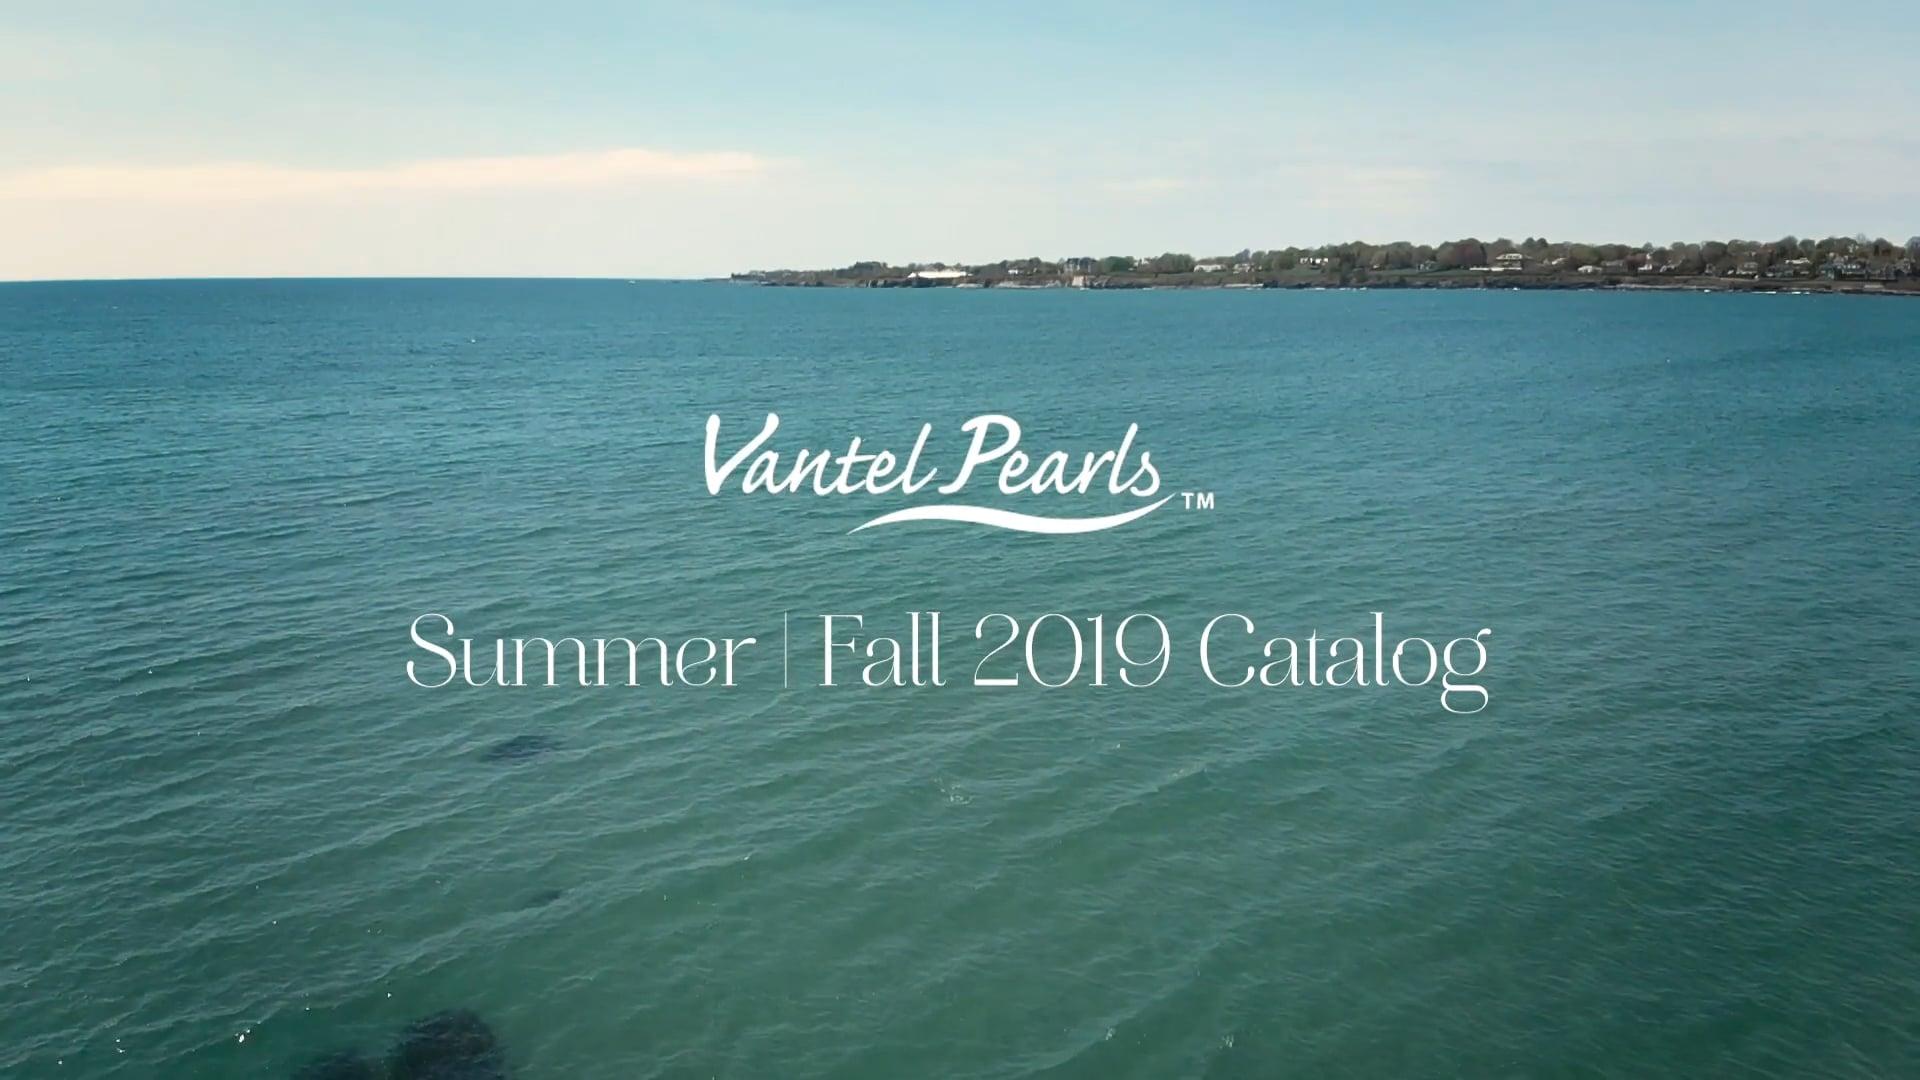 Vantel Pearls 2019 Summer   Fall Catalog